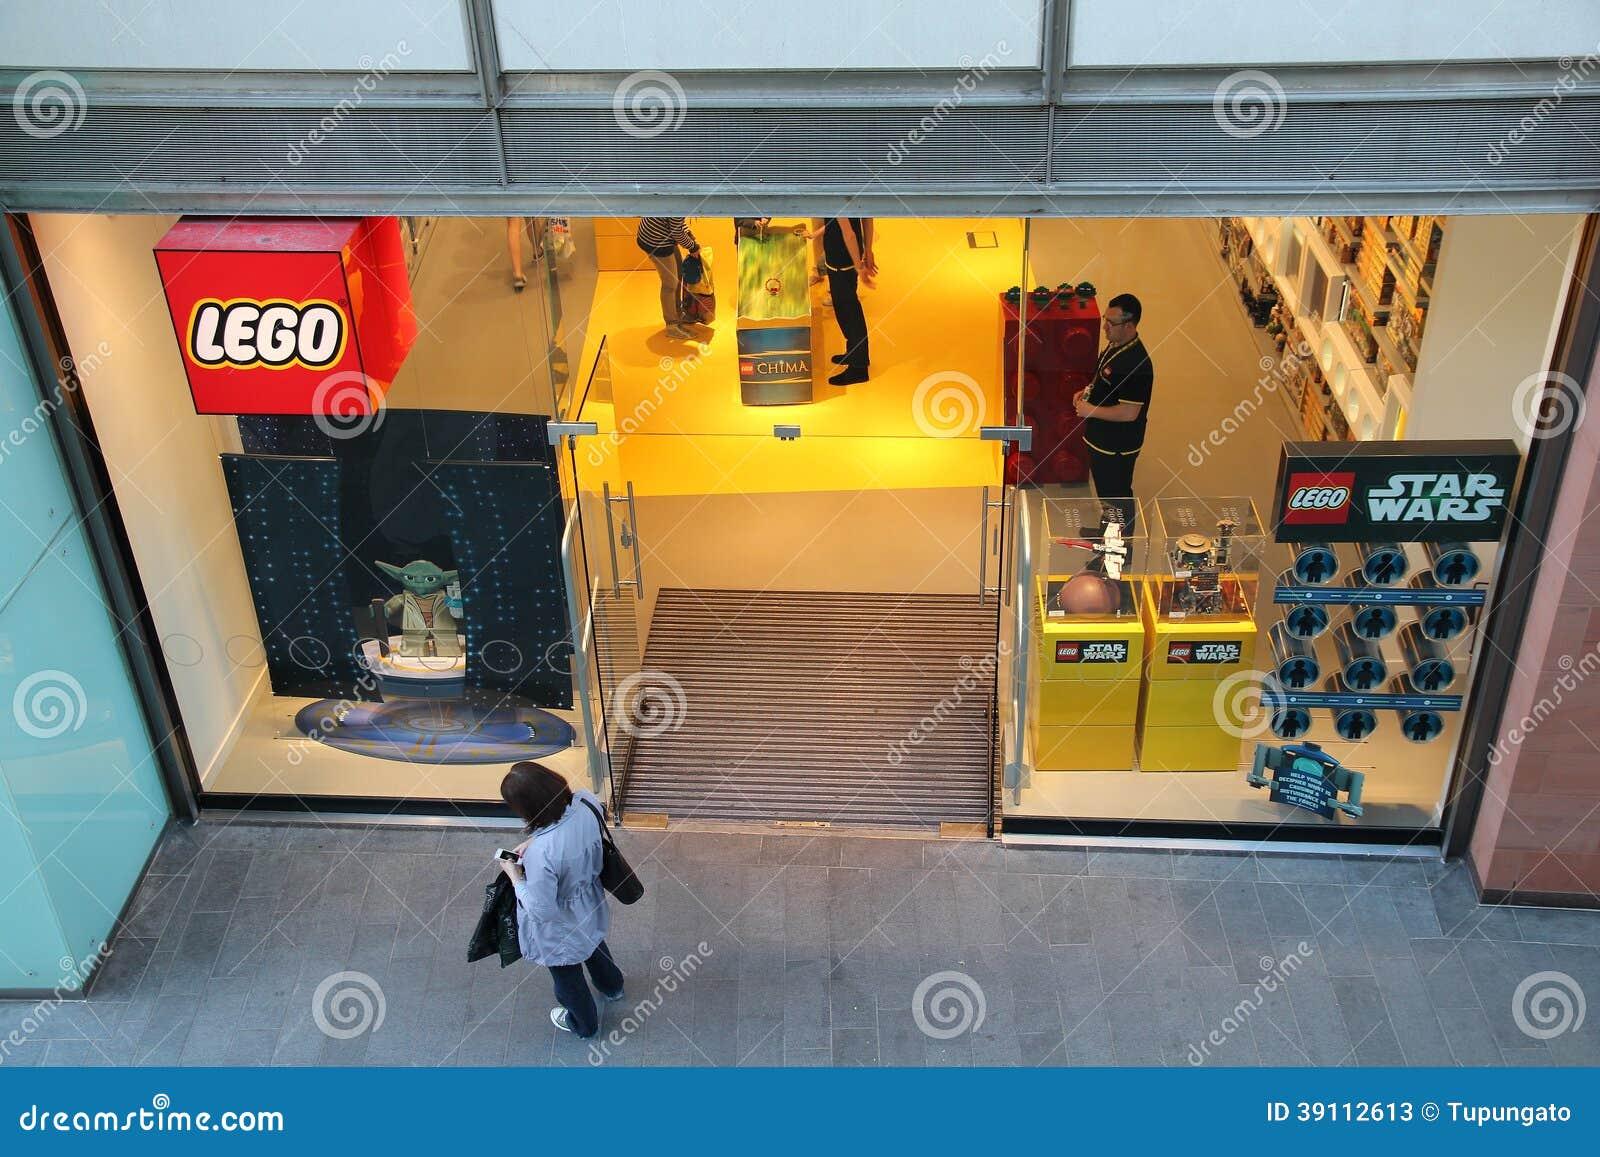 Legoopslag